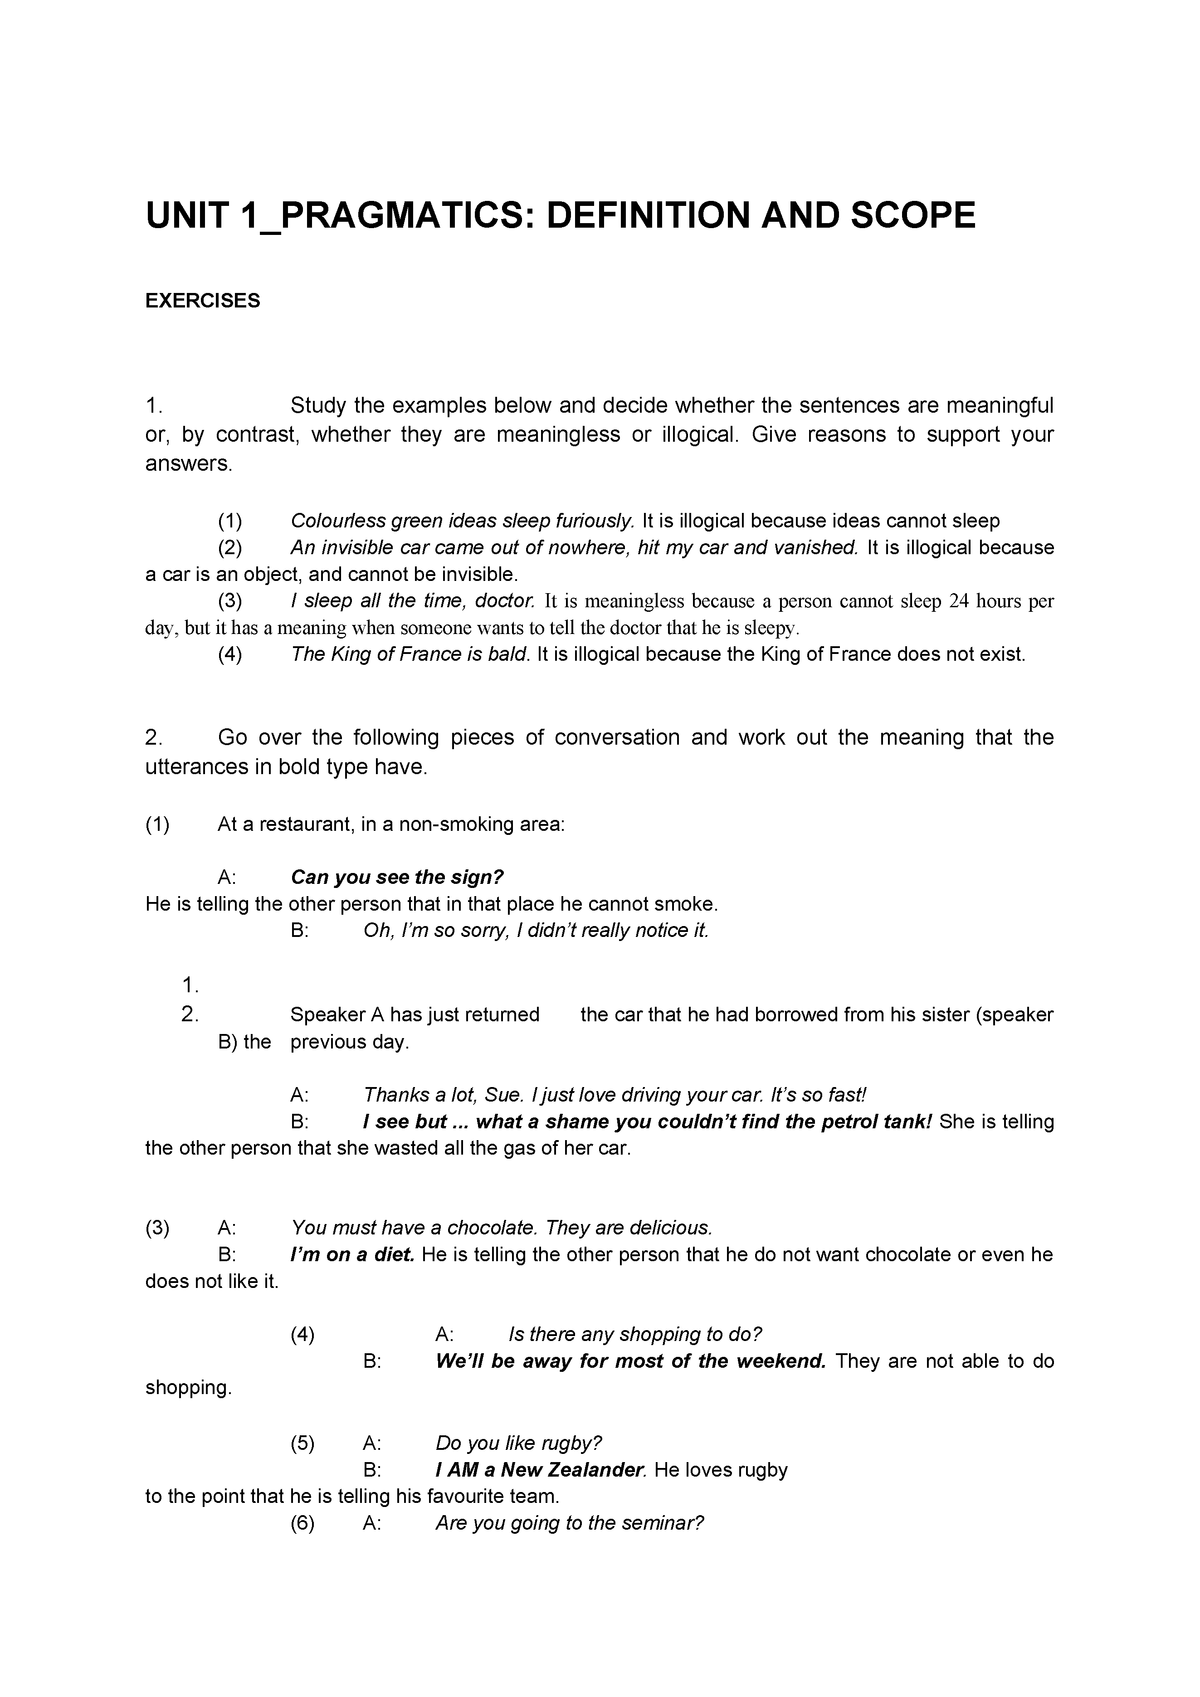 Pragmatics of the hell - Ejercicios - 259093201: Pragmática de la